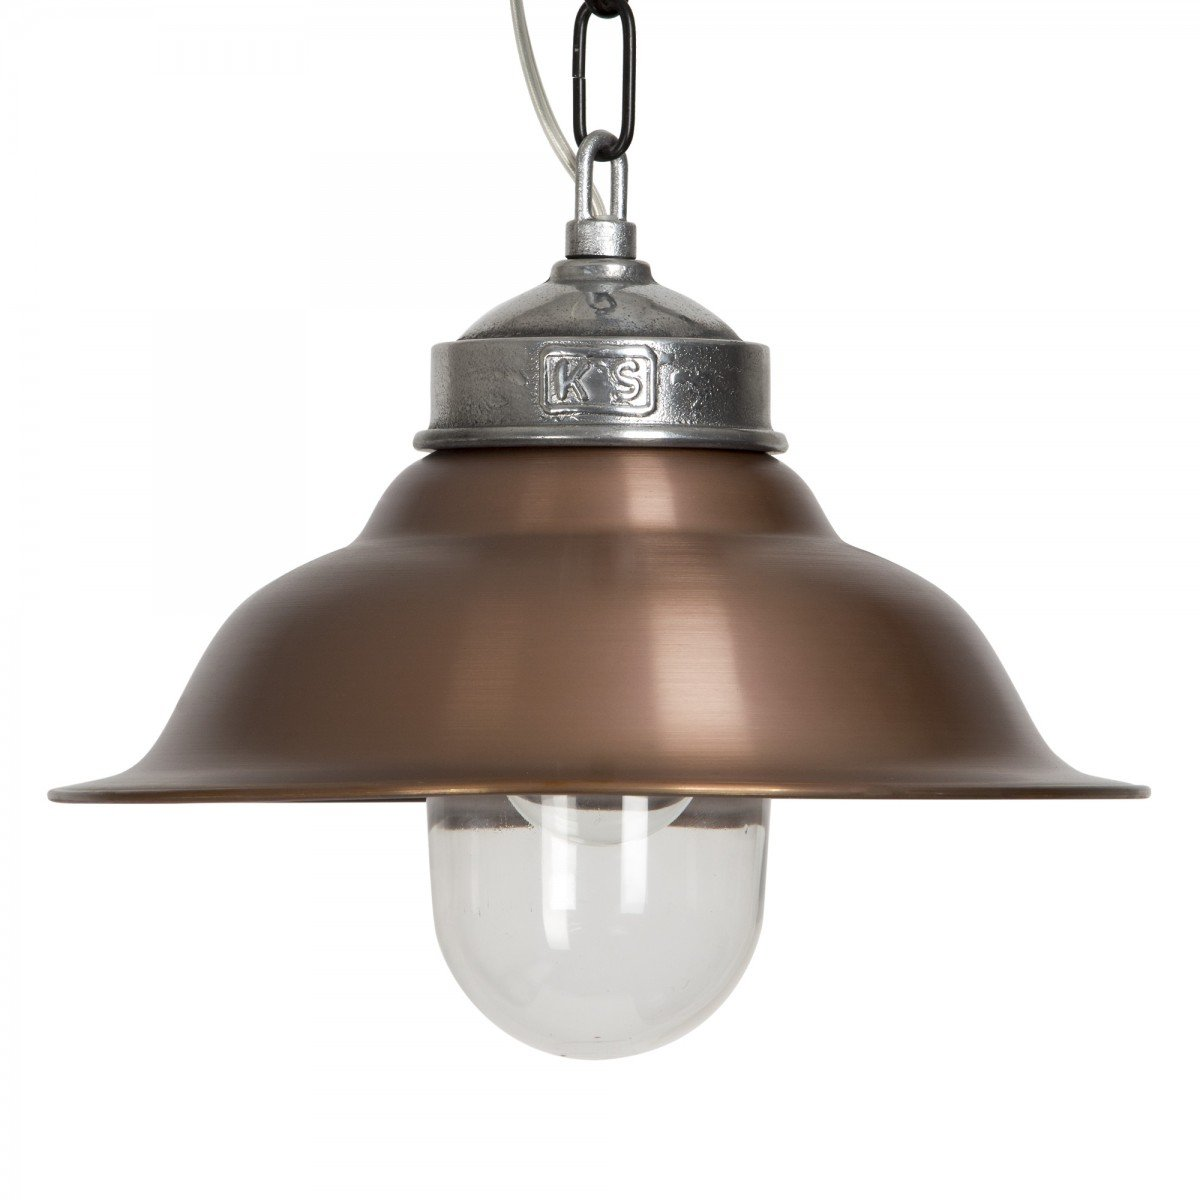 KS Verlichting Koperen hanglamp Porto Fino KS 6572